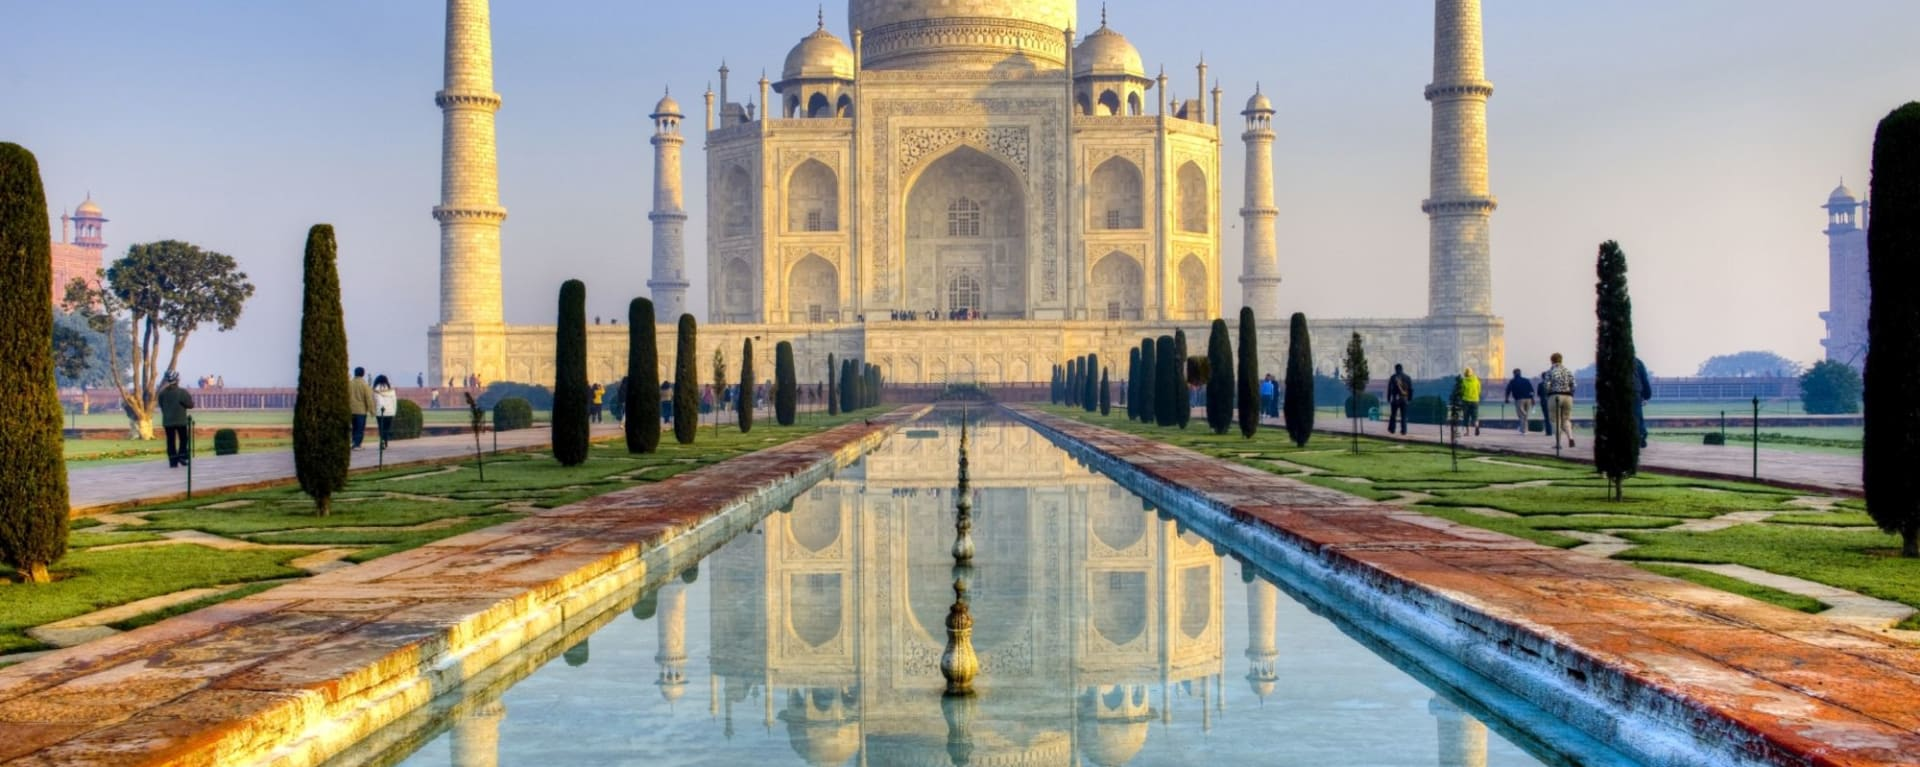 «The Deccan Odyssey» - Die Glanzlichter Rajasthans ab Mumbai: Agra Taj Mahal